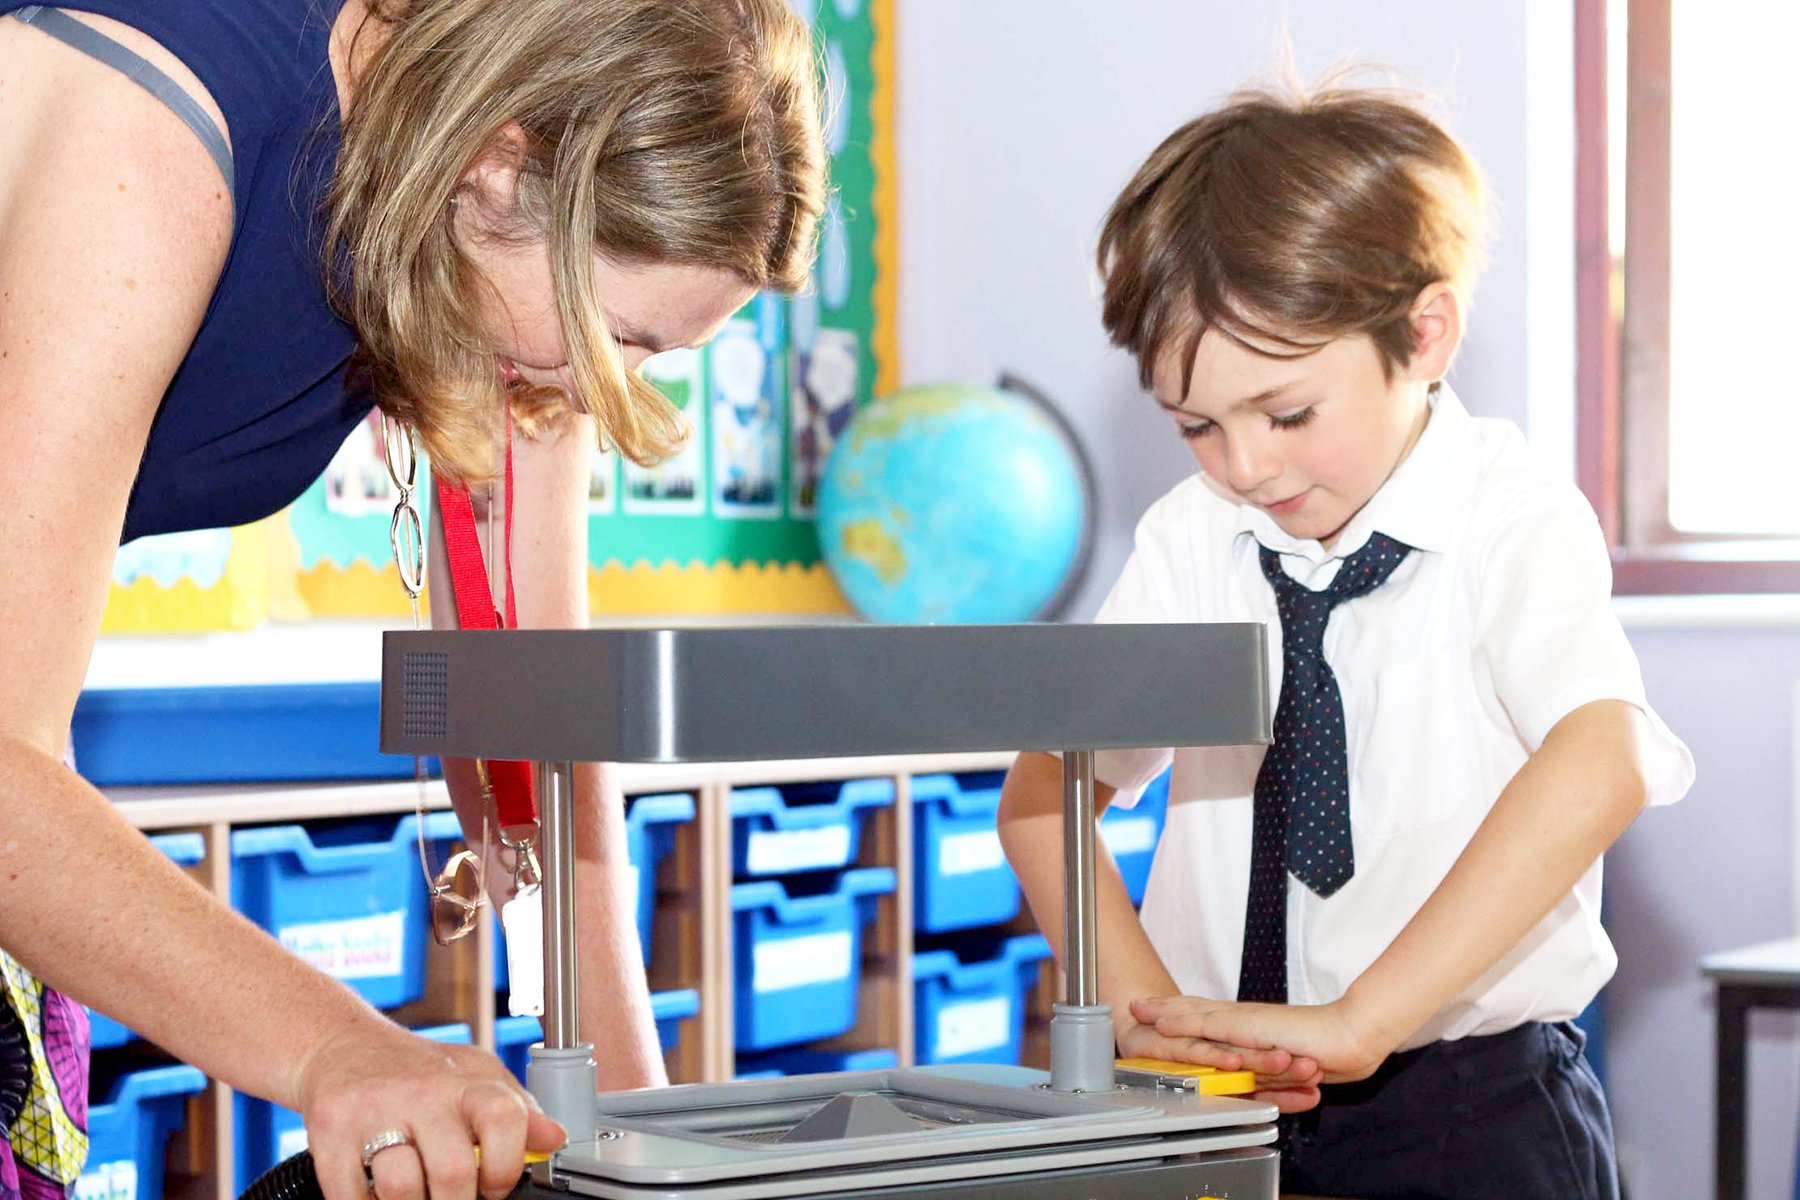 Using the Mayku FormBox in Education